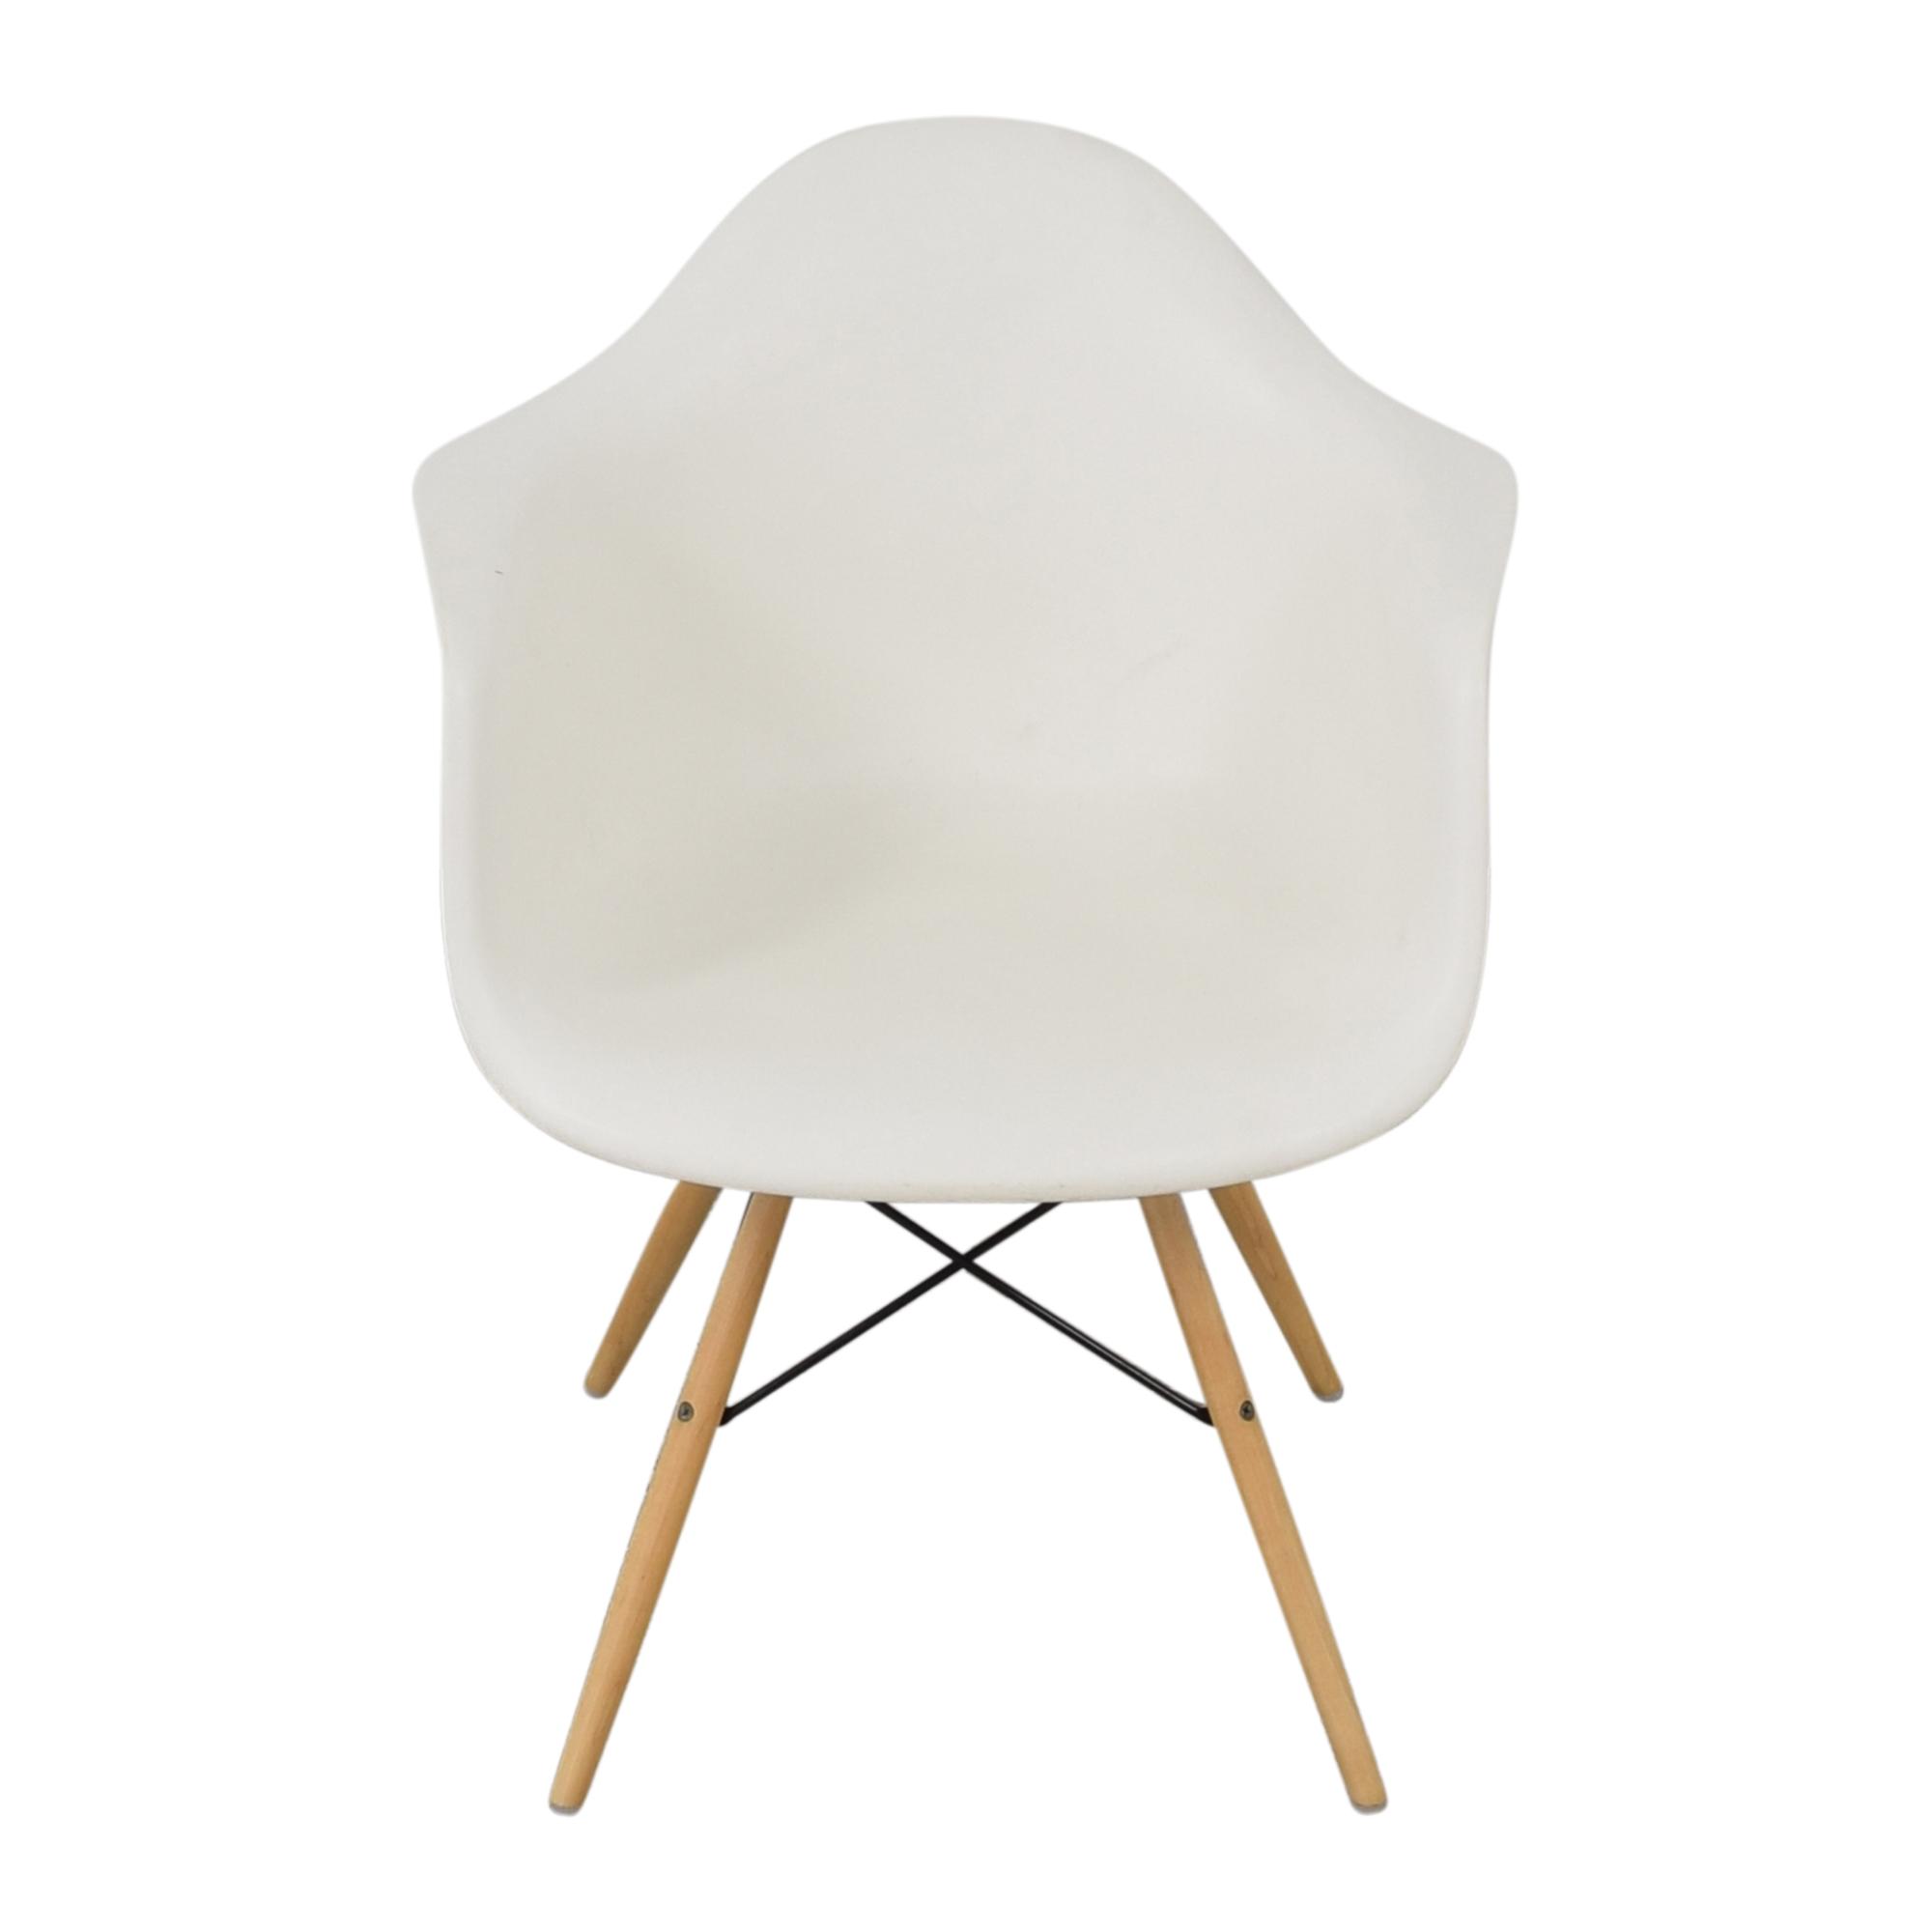 Herman Miller Herman Miller Eames Molded Arm Chair ma